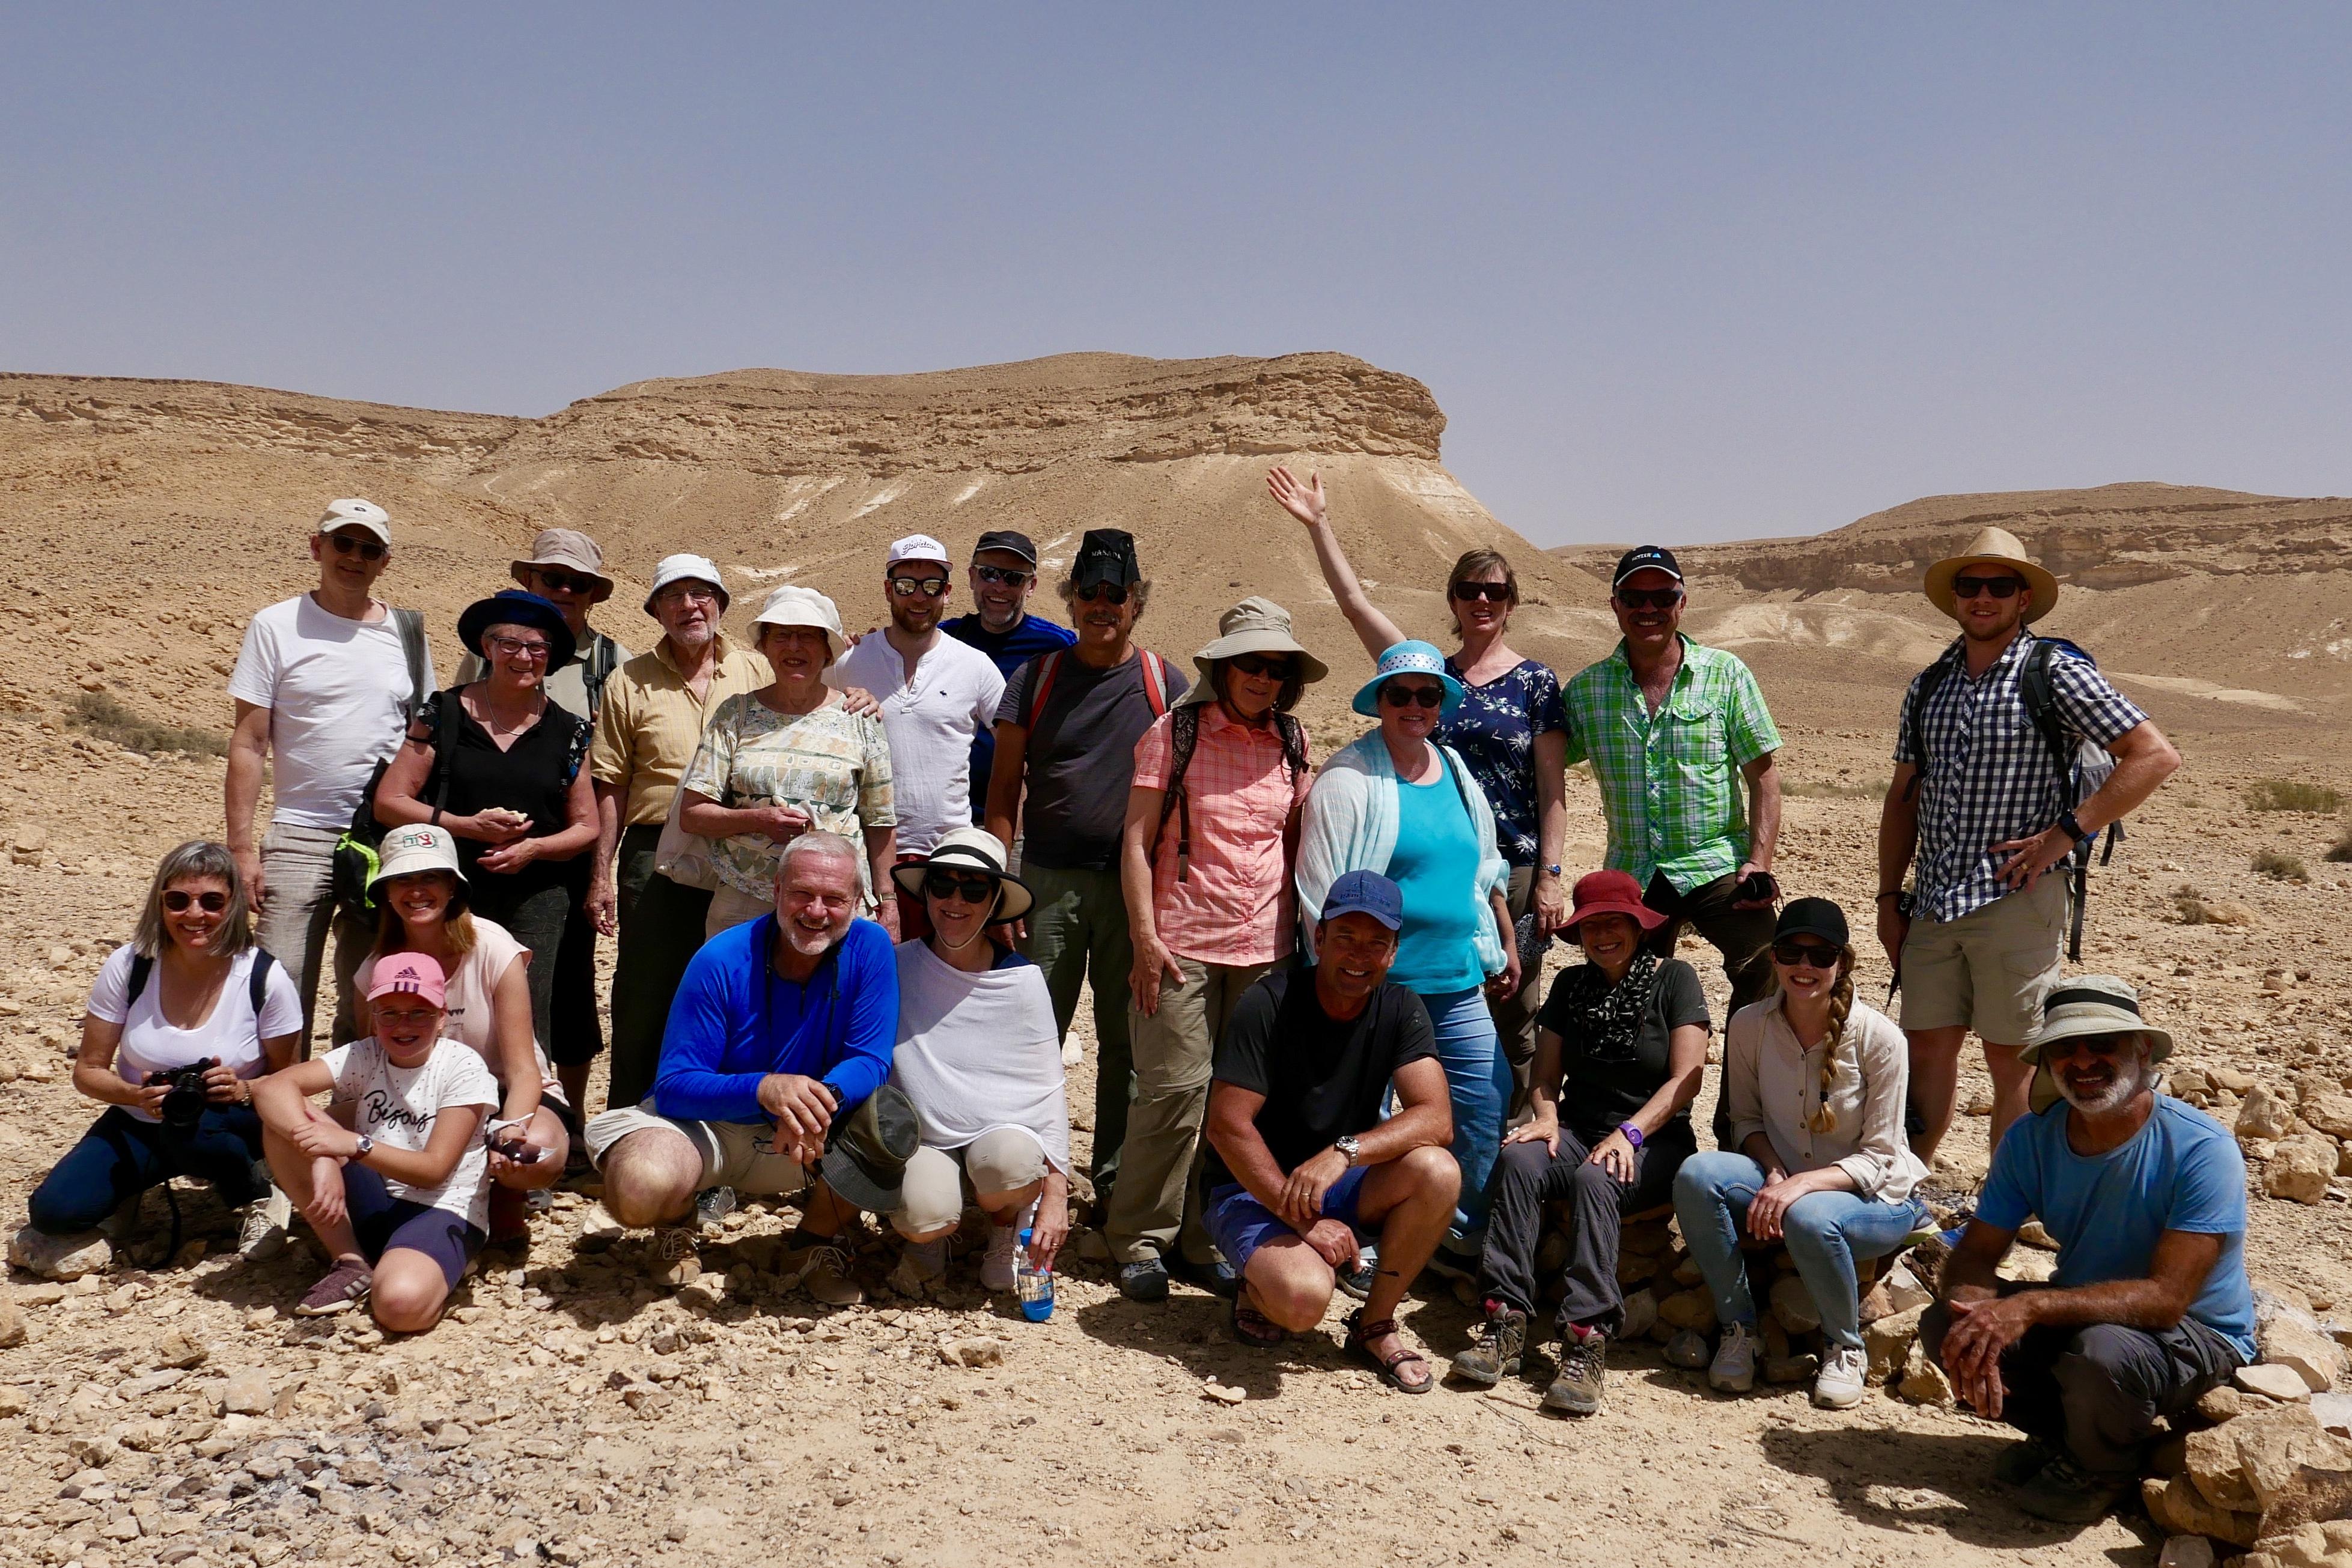 Gruppe vor dem Berg Sinai (Karkom)